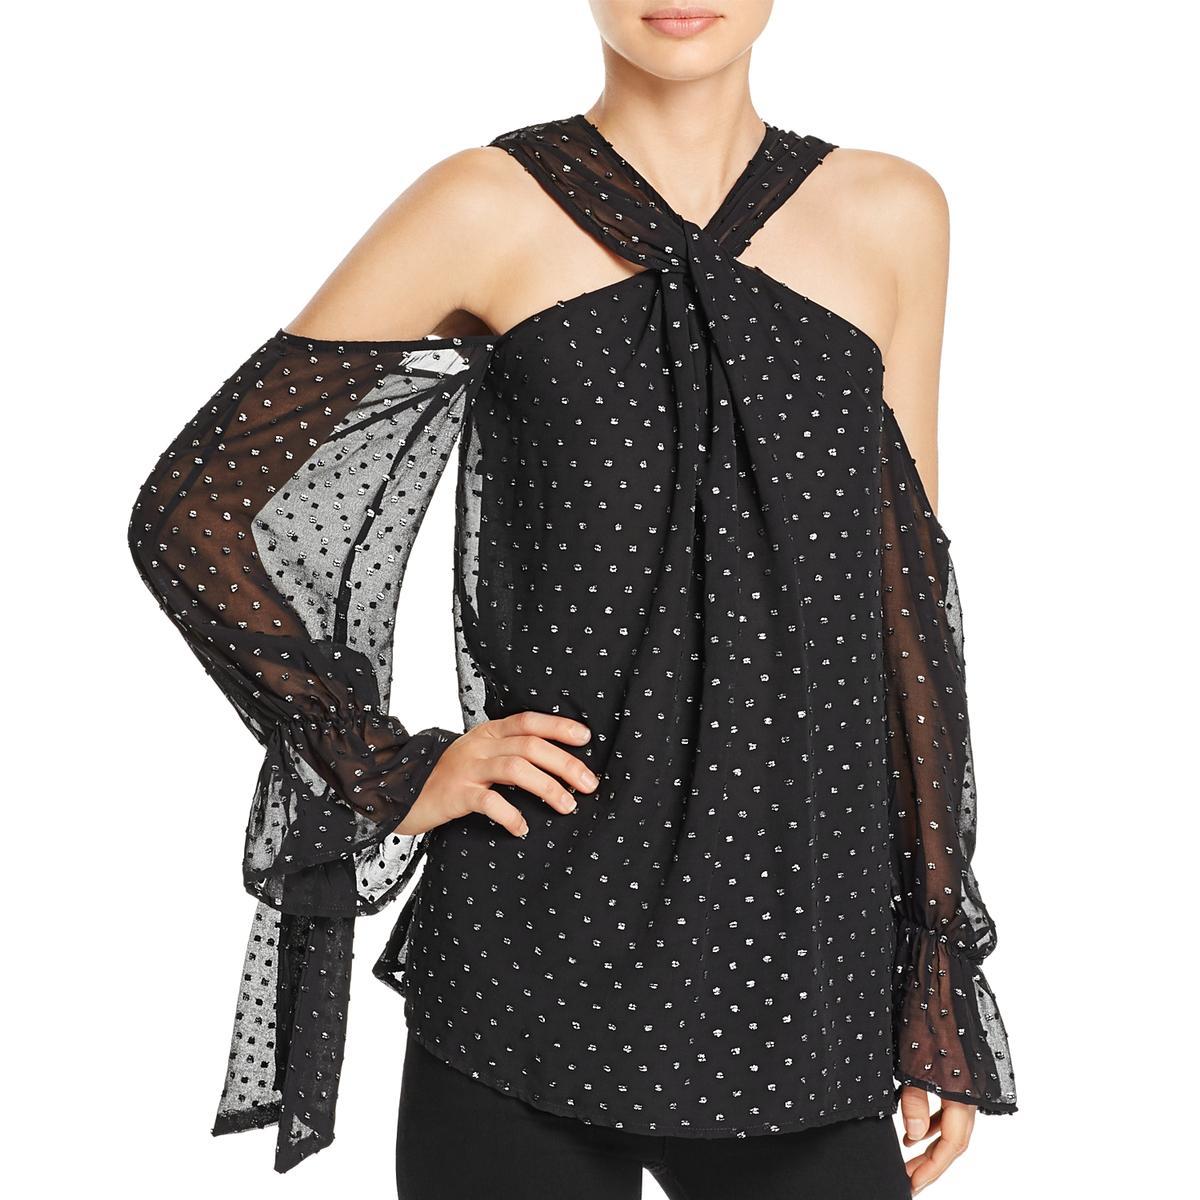 35a009cb82 Details about Bardot Womens Cold Shoulder Sheer Crisscross Pullover Top  Blouse BHFO 9281